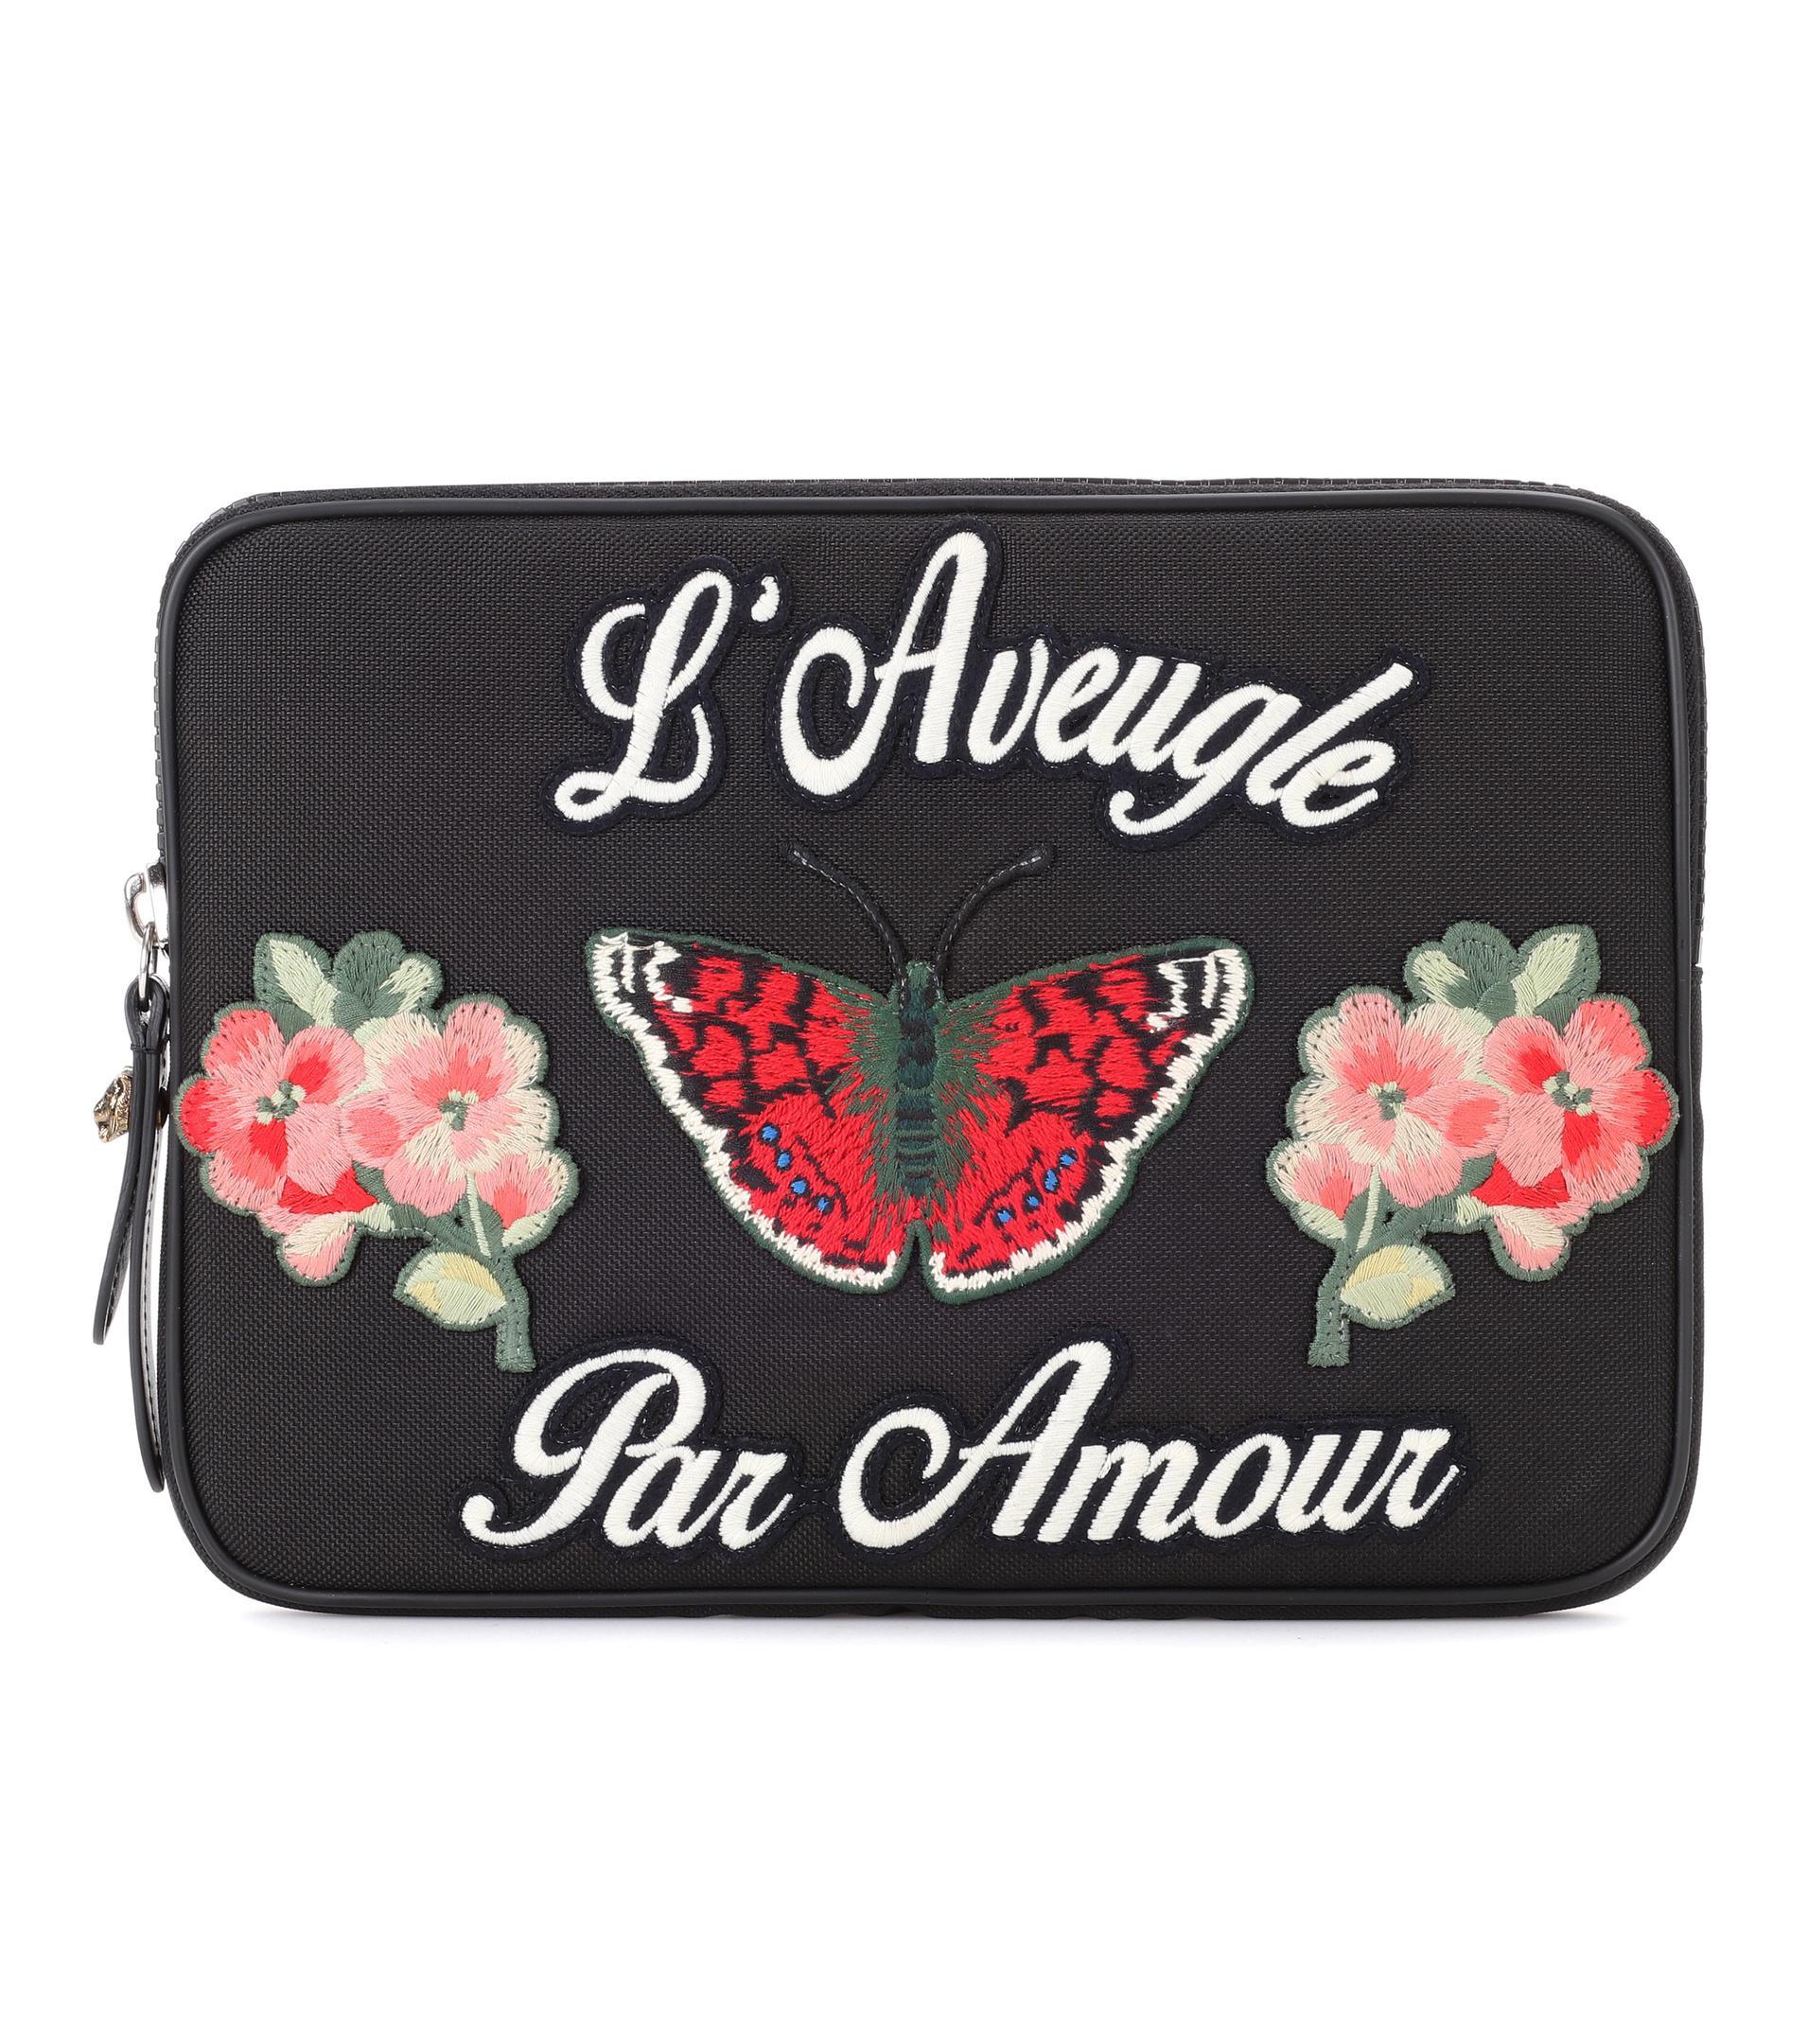 Embroidered iPad case Gucci INrdb7